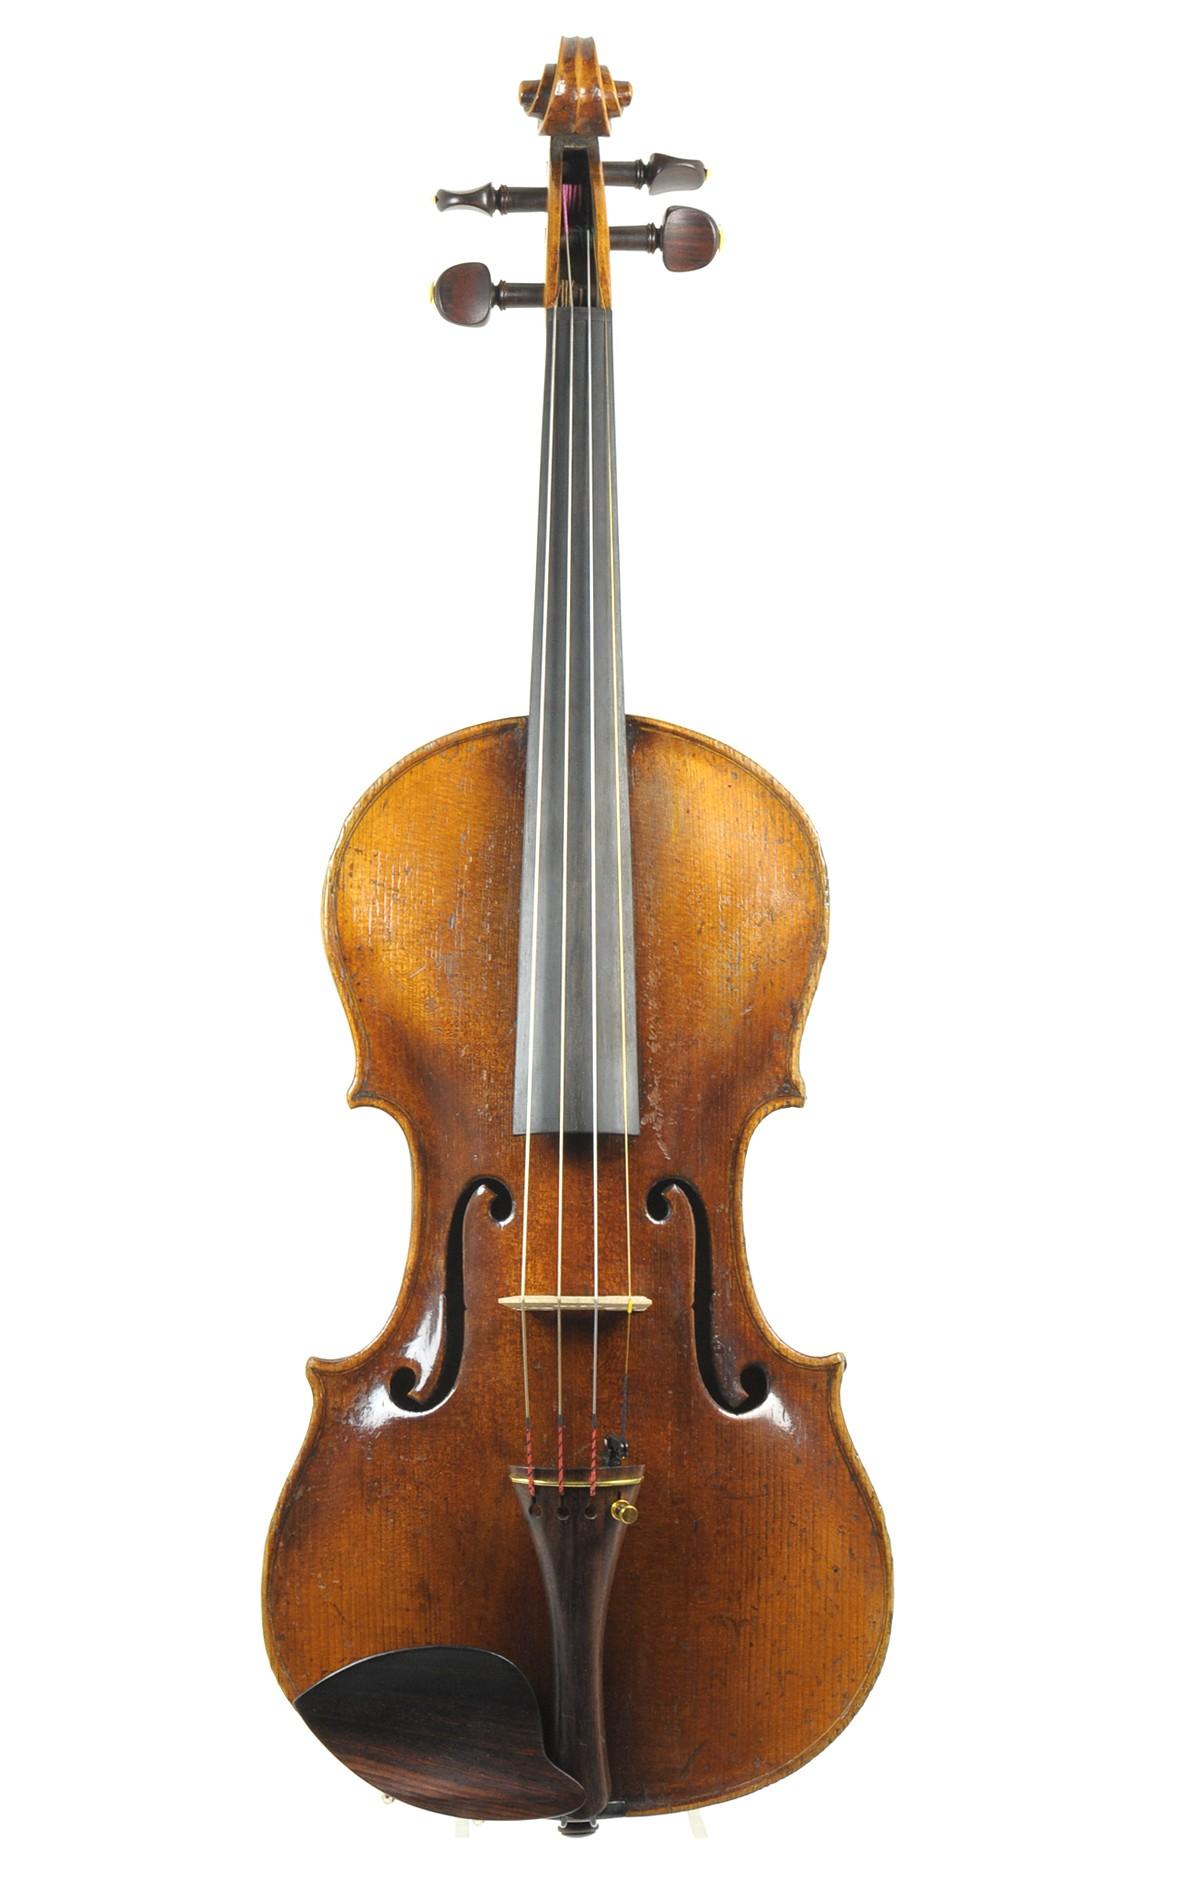 Violin by Friedrich August Glass, Klingenthal ca. 1850 - top